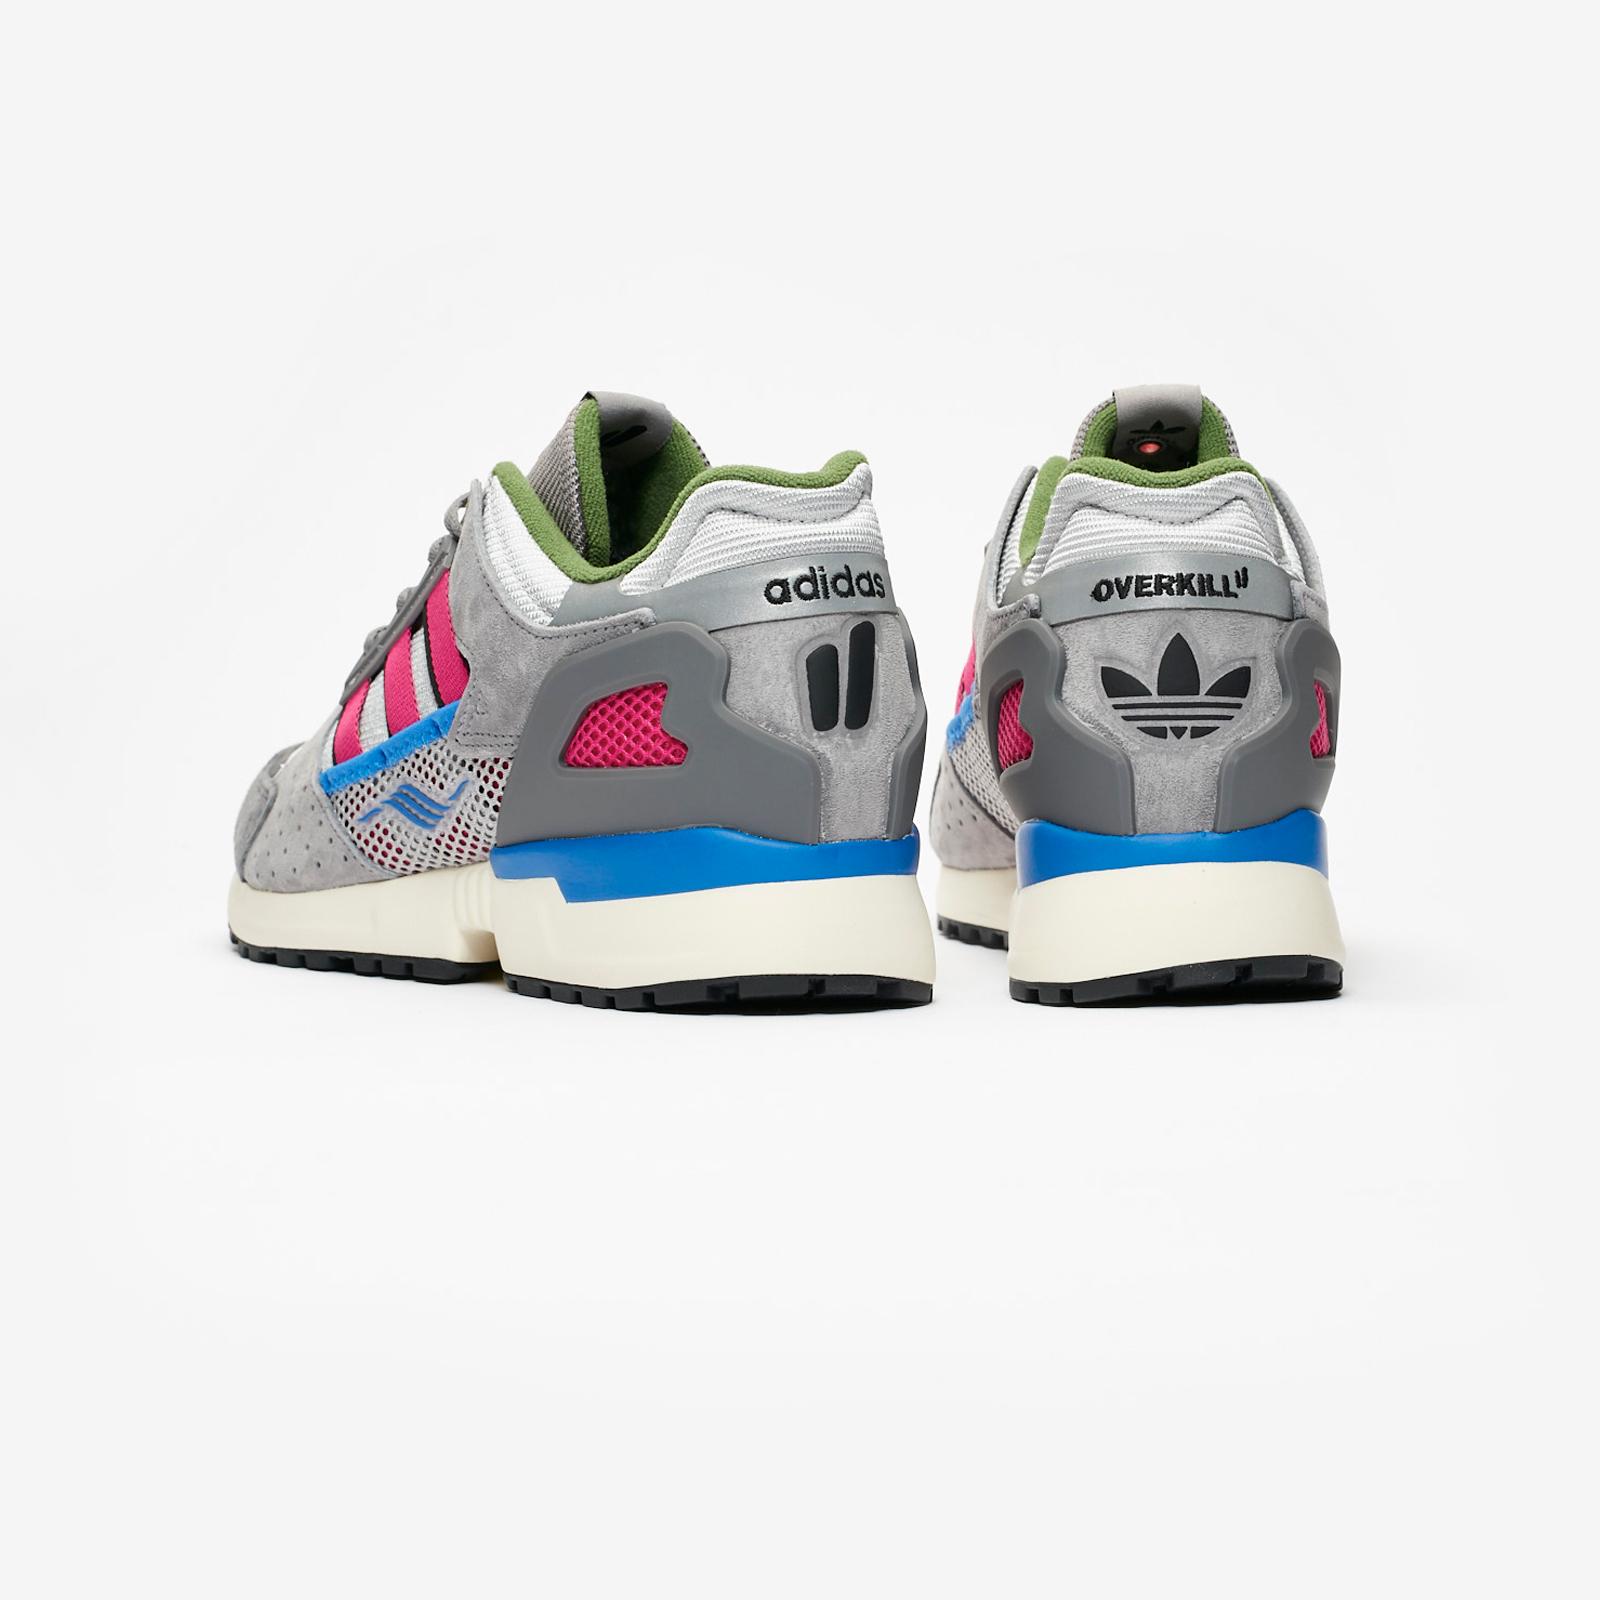 finest selection 56045 66e7f adidas ZX 10.000 C x Overkill - G26252 - Sneakersnstuff ...